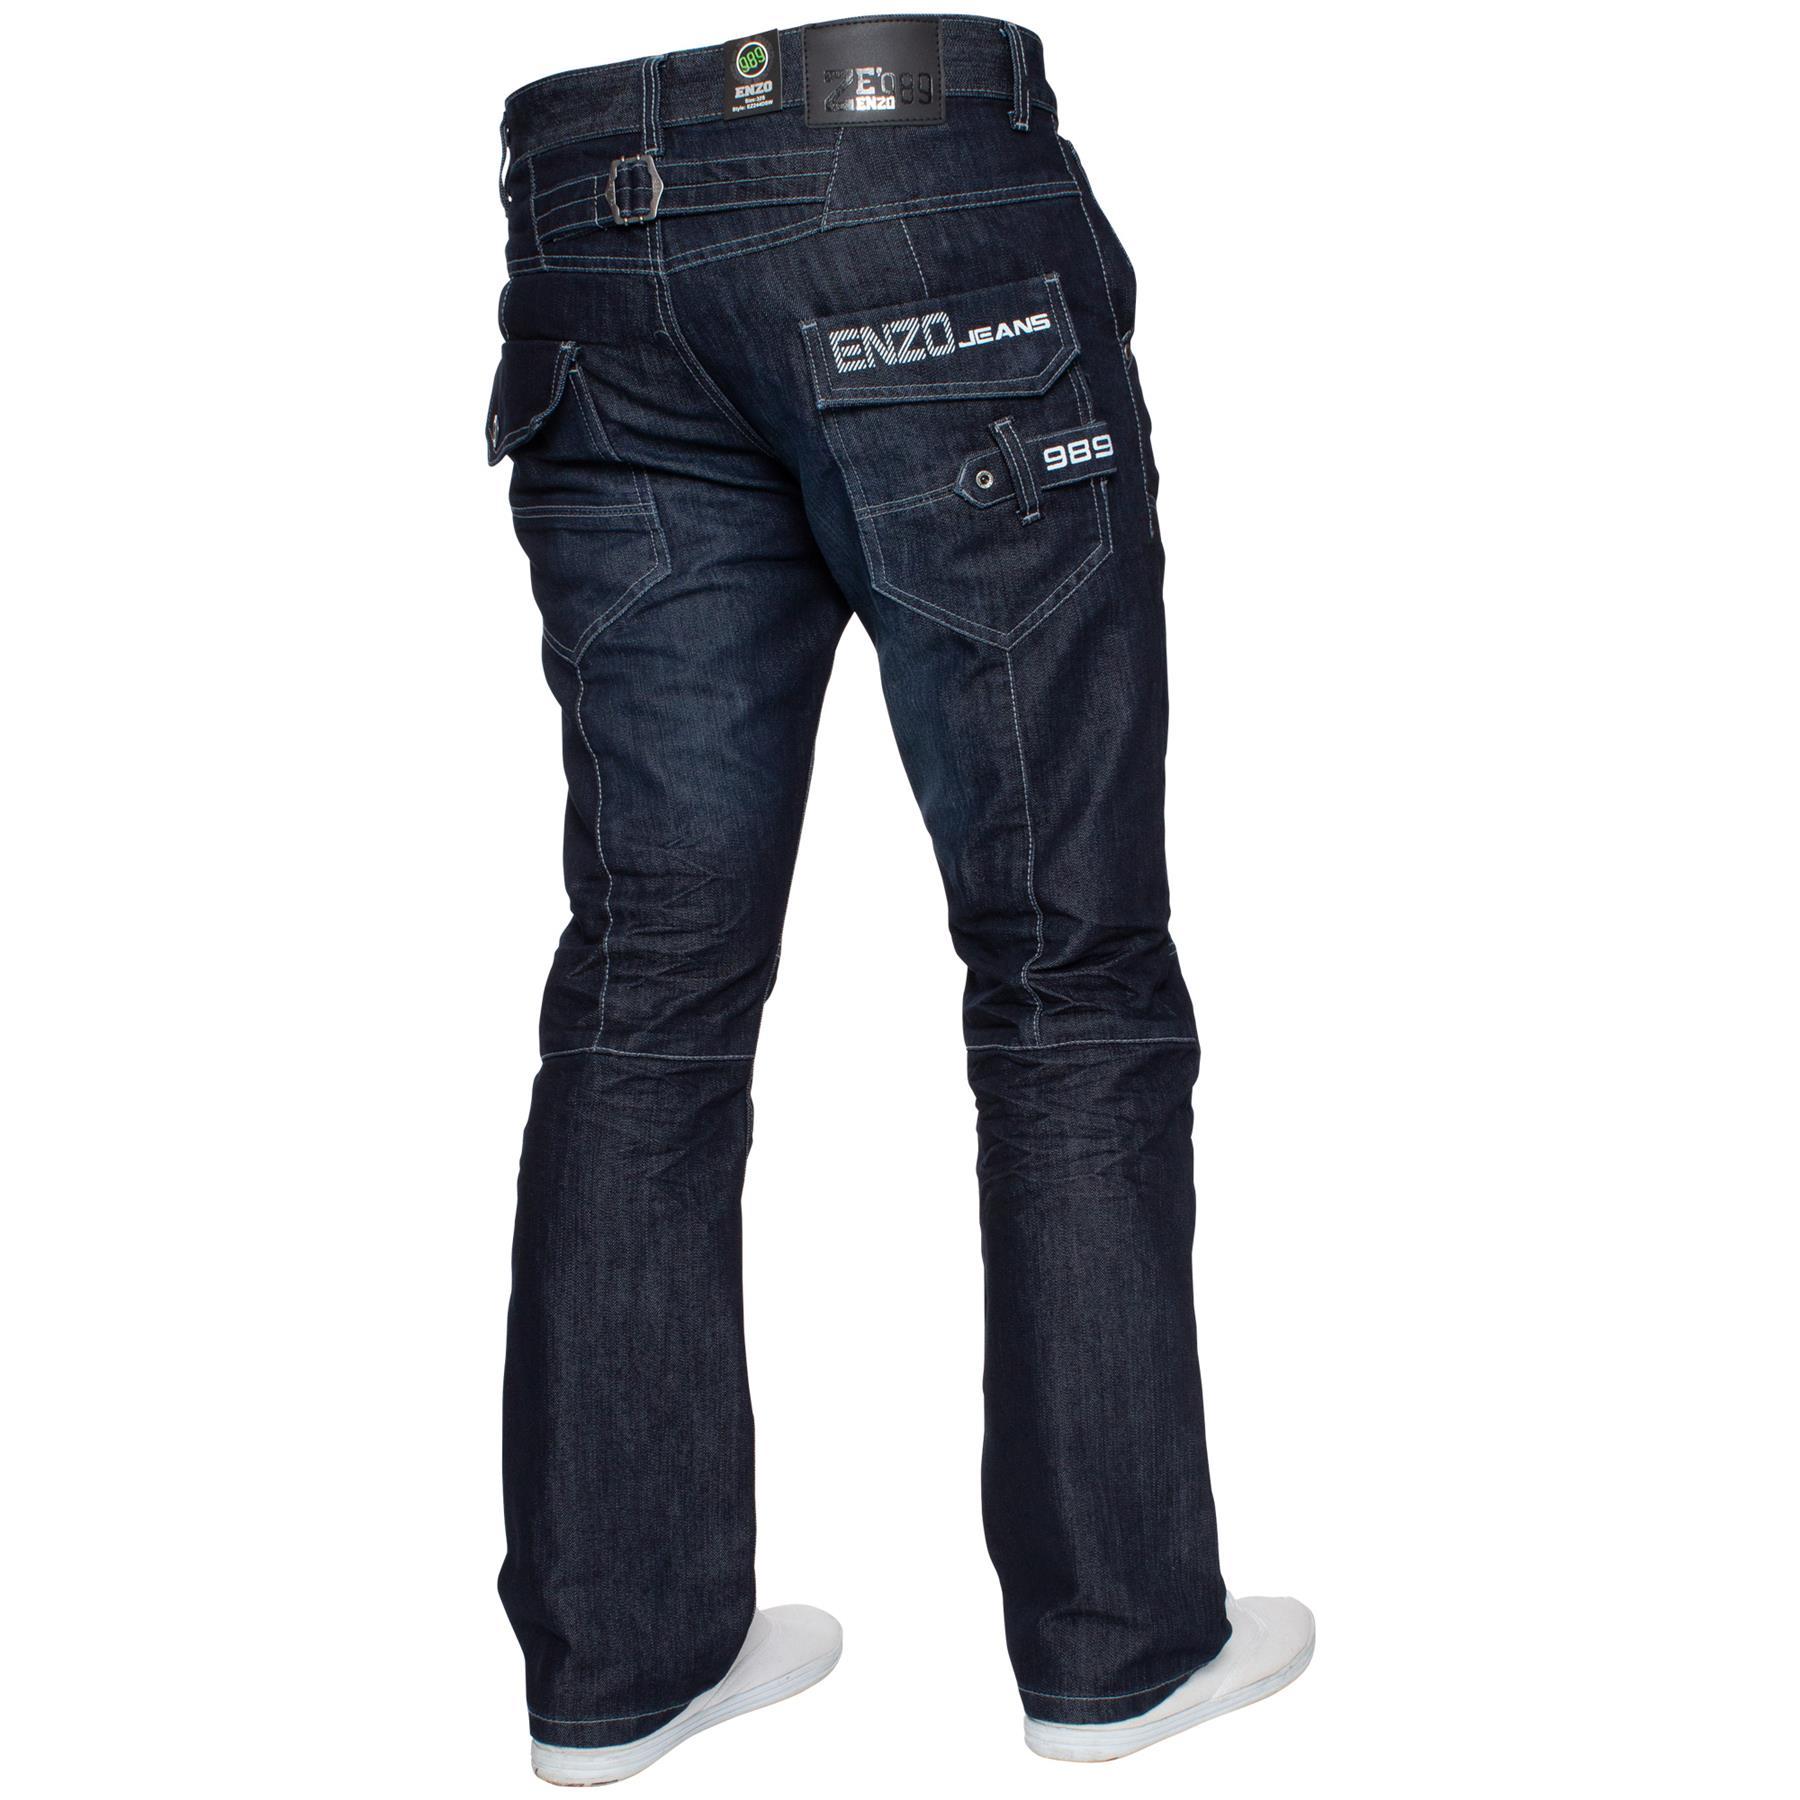 ENZO-Jeans-para-hombre-Big-Alto-Pierna-King-Size-Jeans-Pantalones-Chino-Pantalones-Pantalones-44-034 miniatura 72